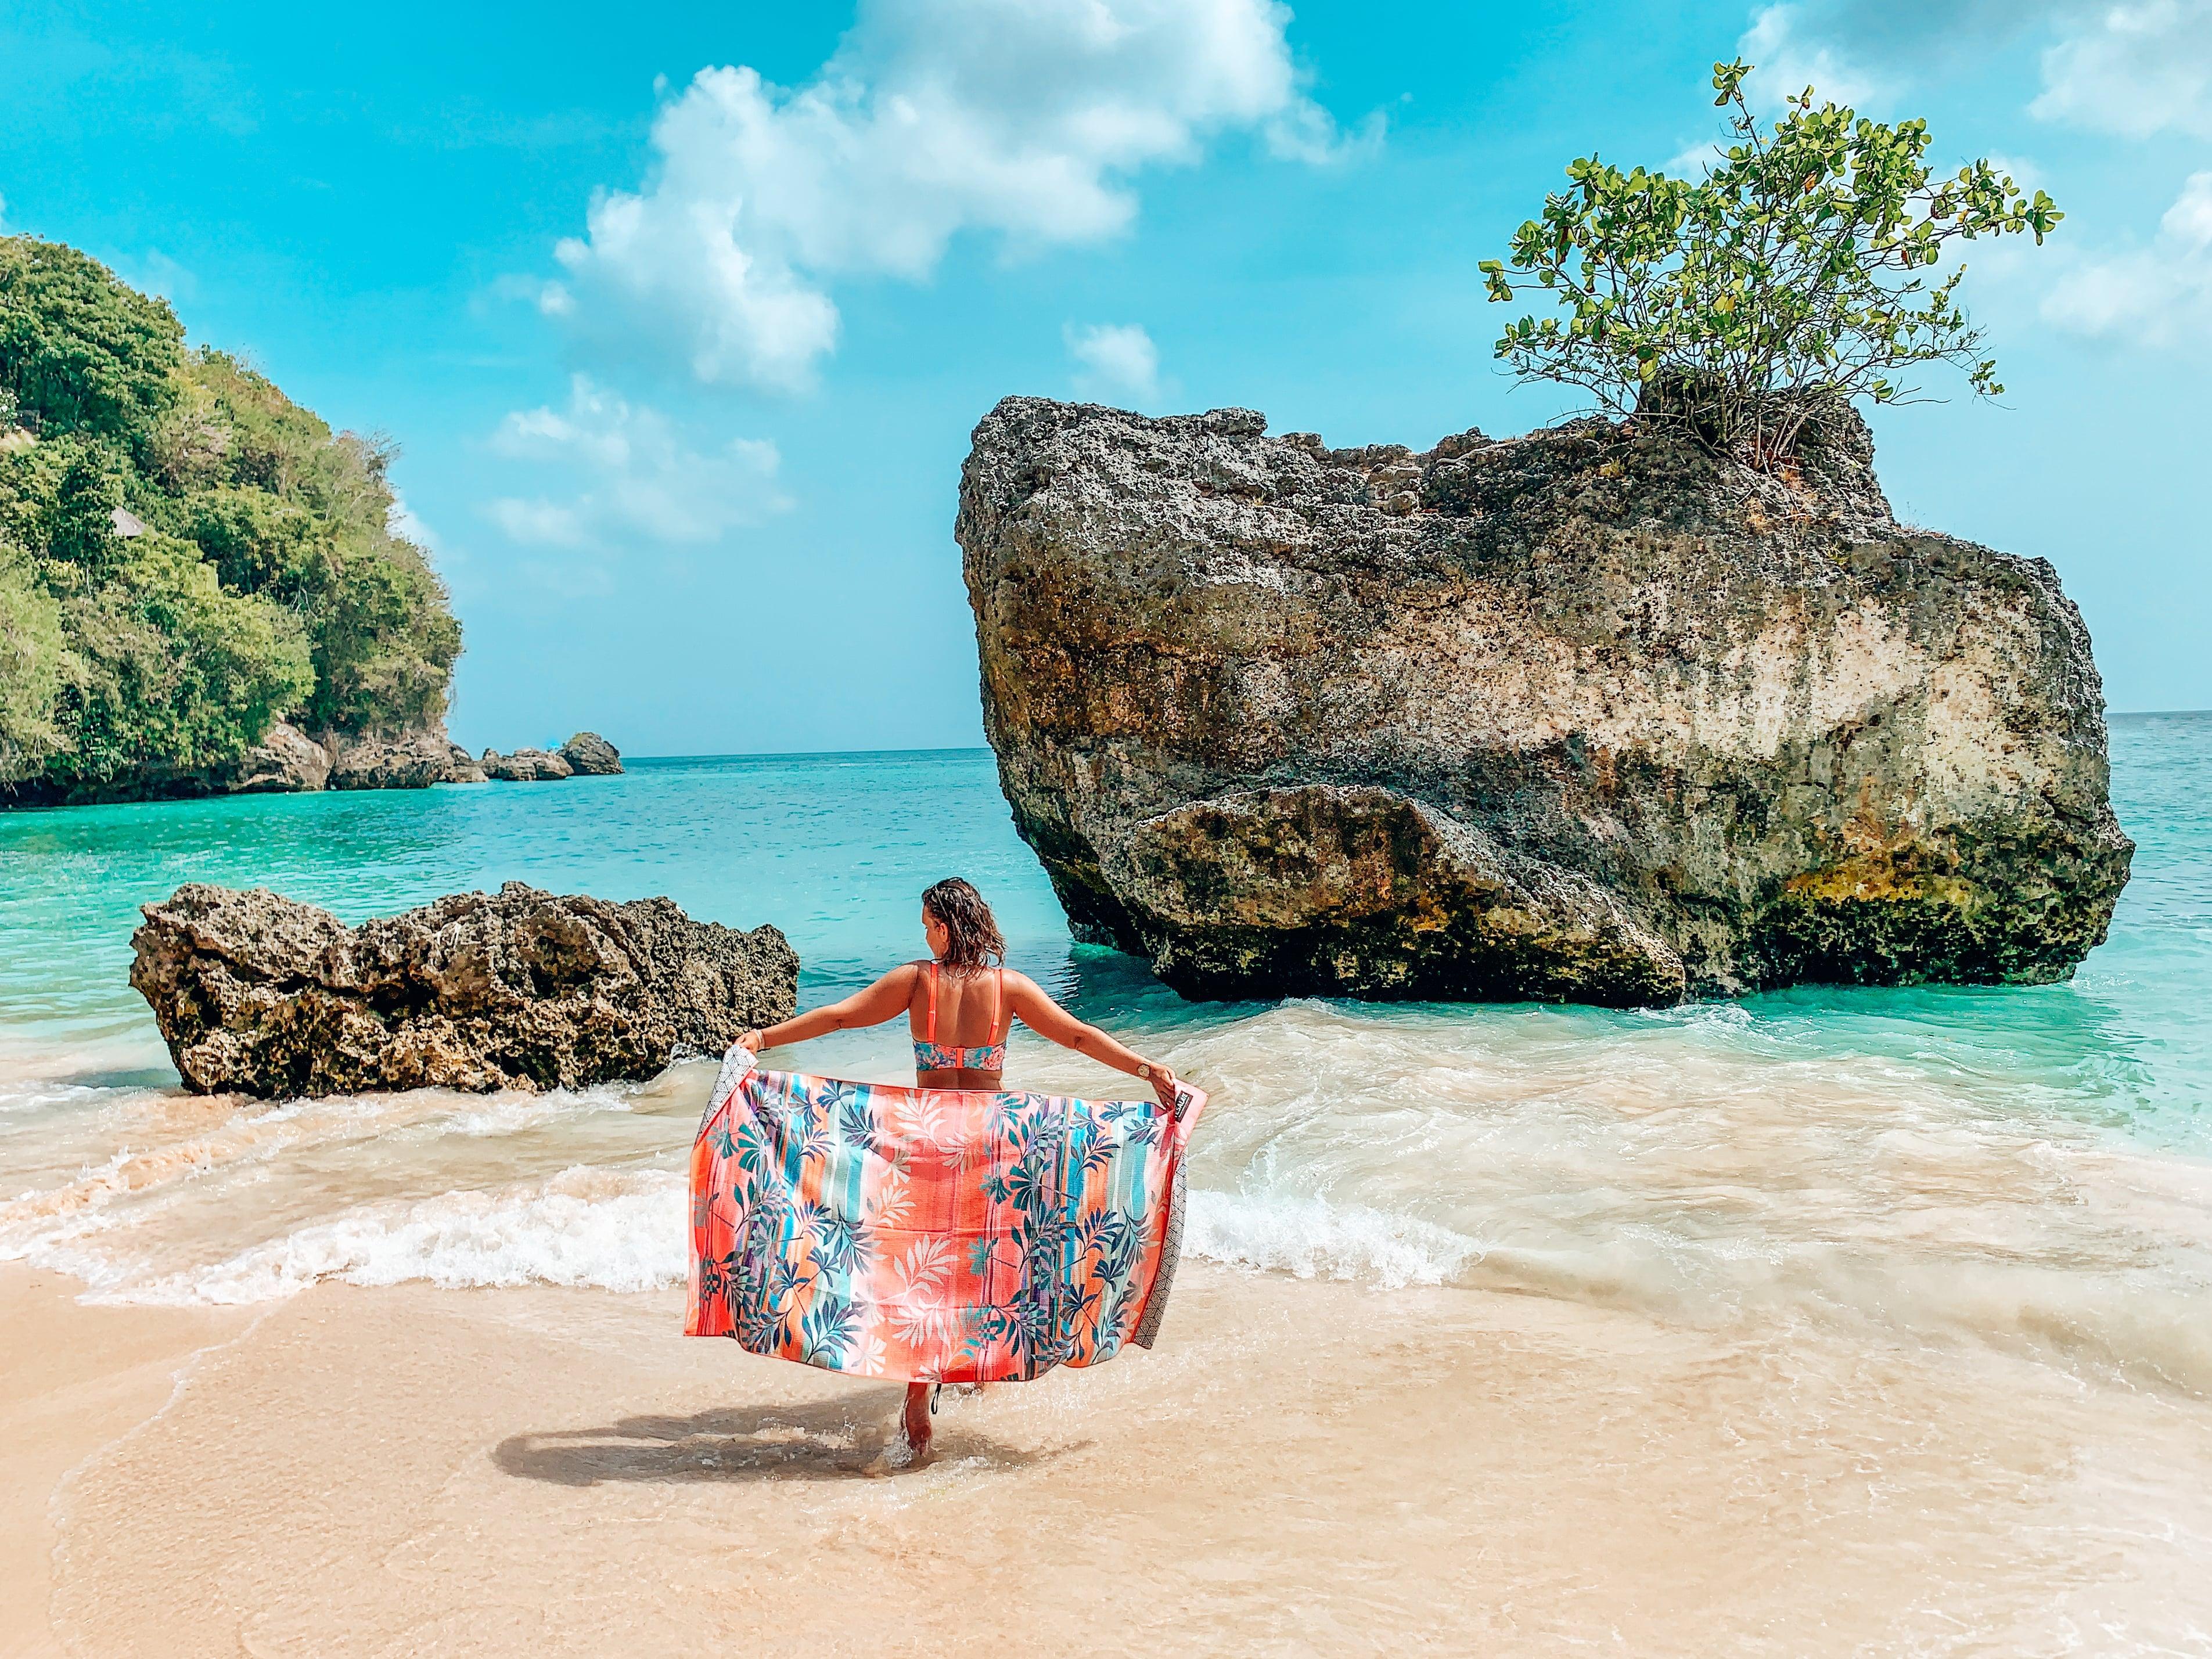 5 reasons to visit Bali